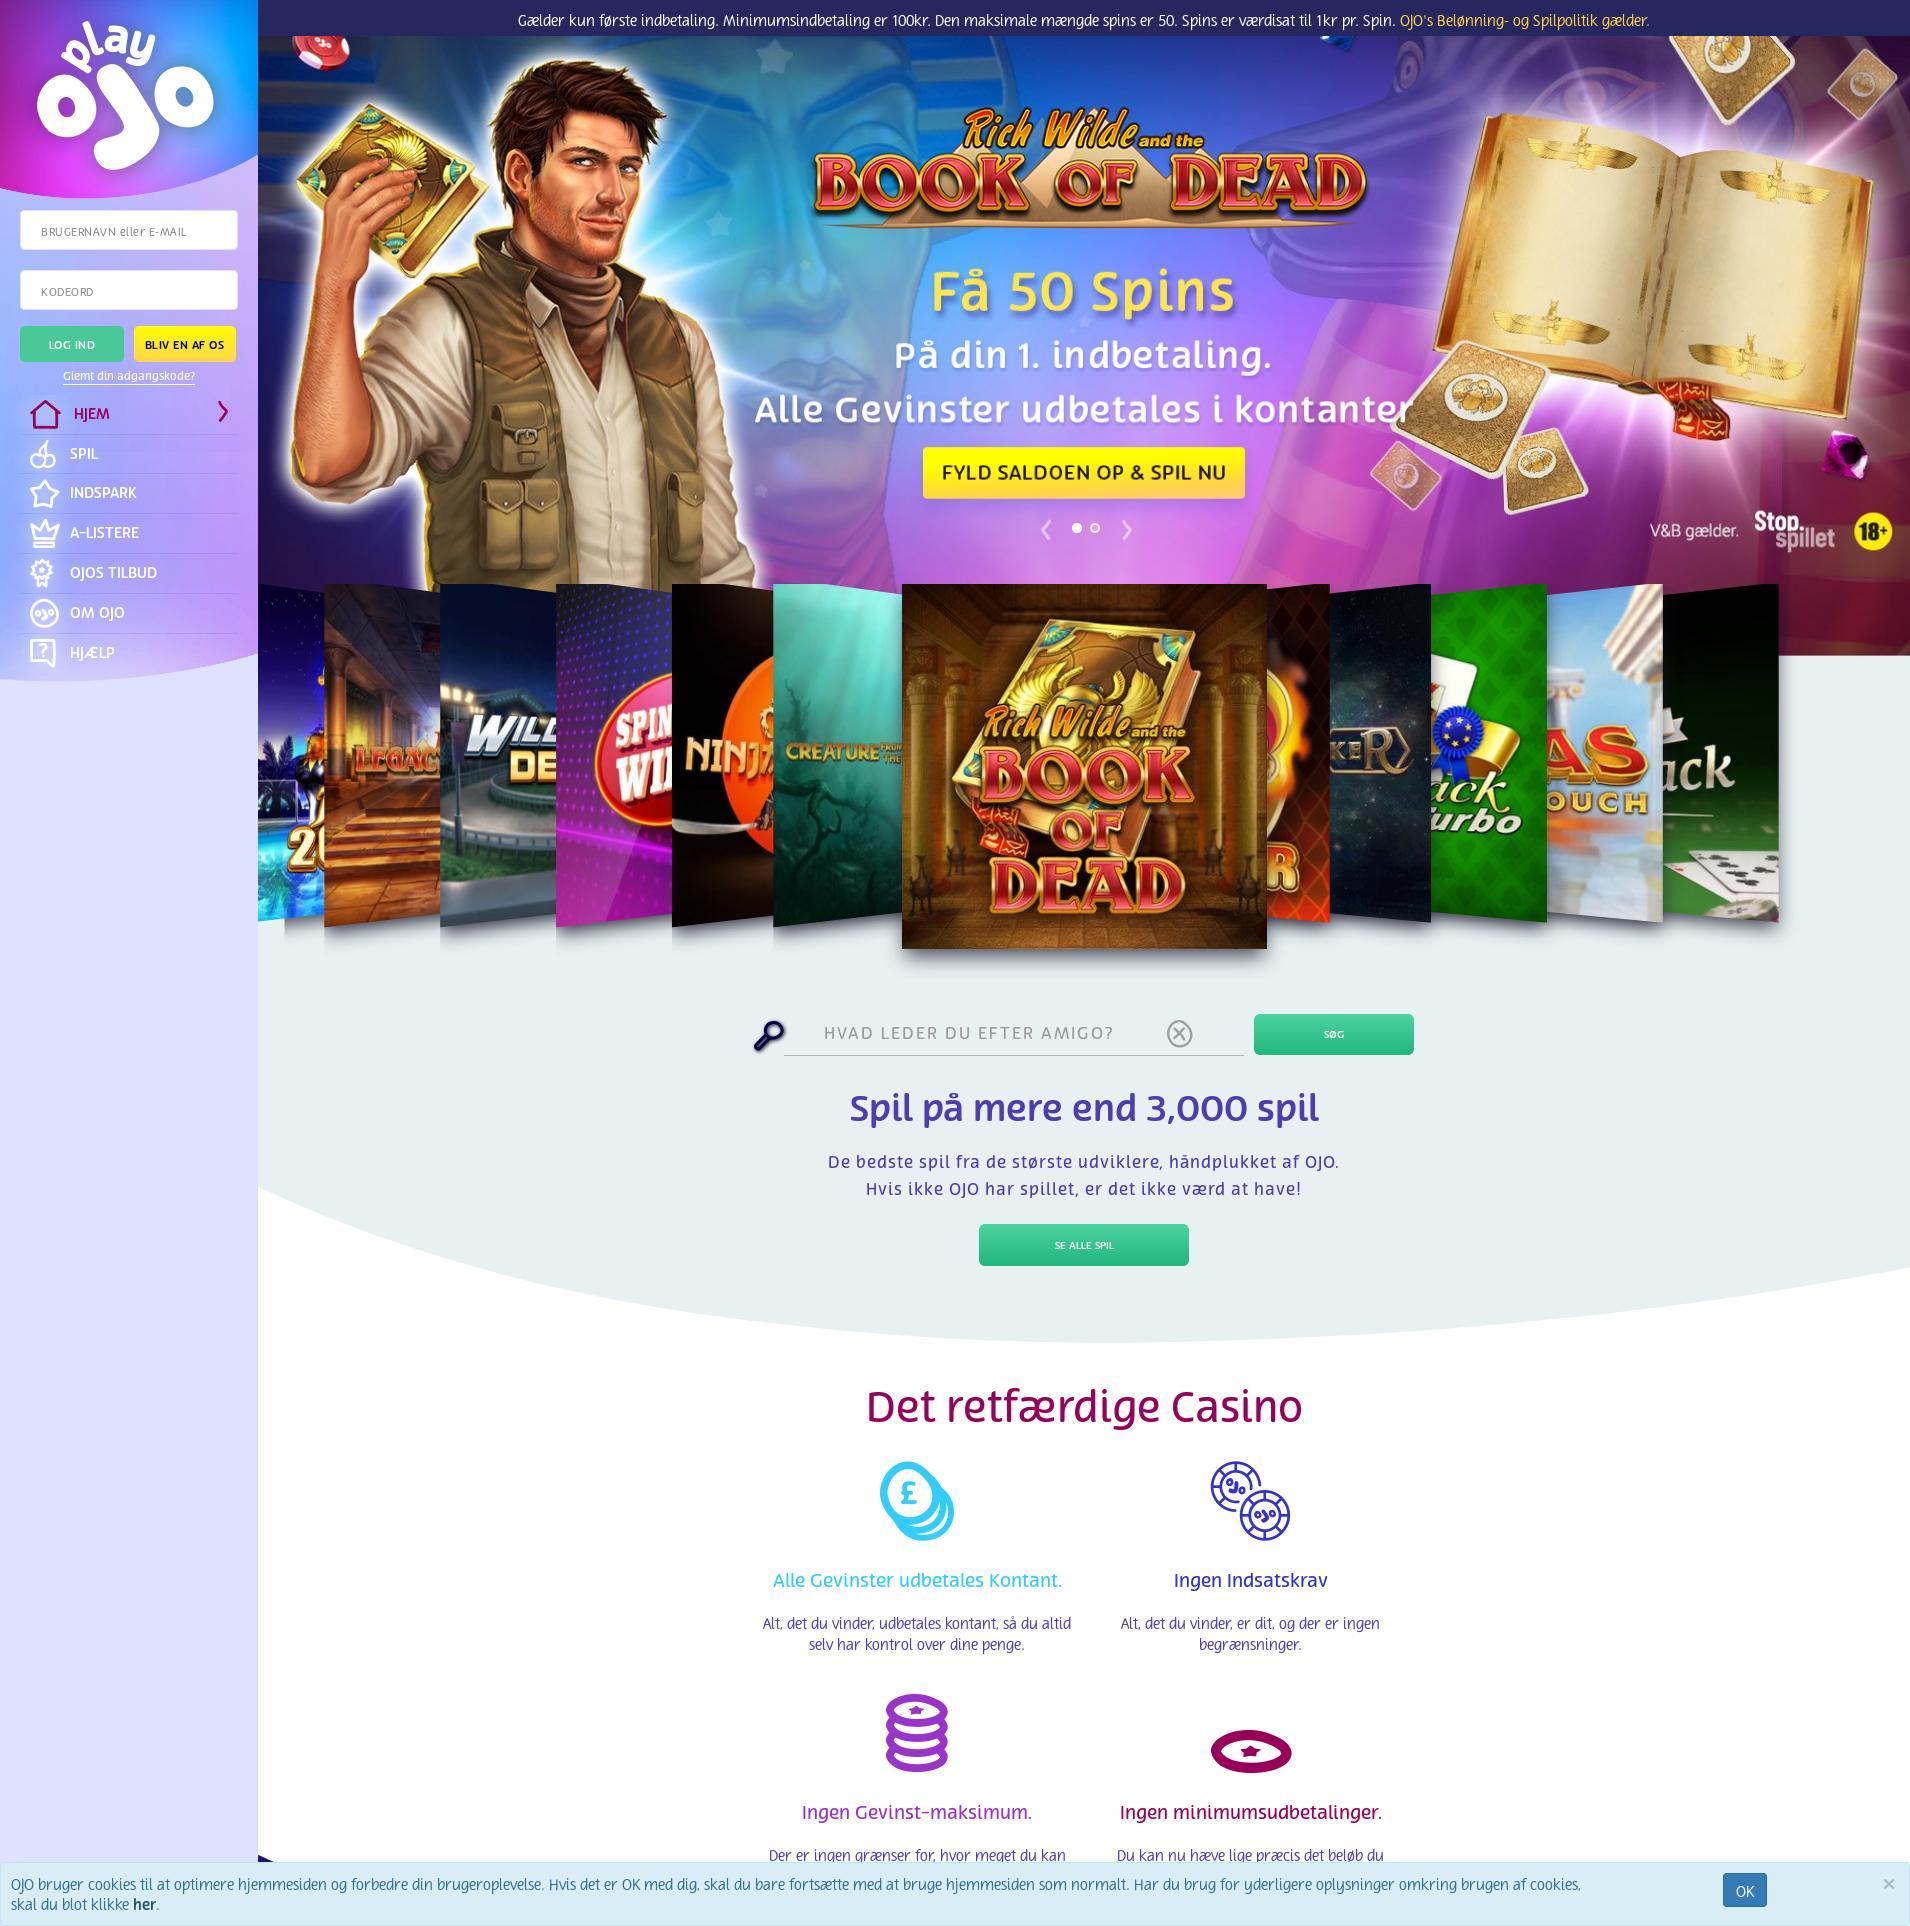 Casino screen Lobby 2020-01-22 pentru Danemarca